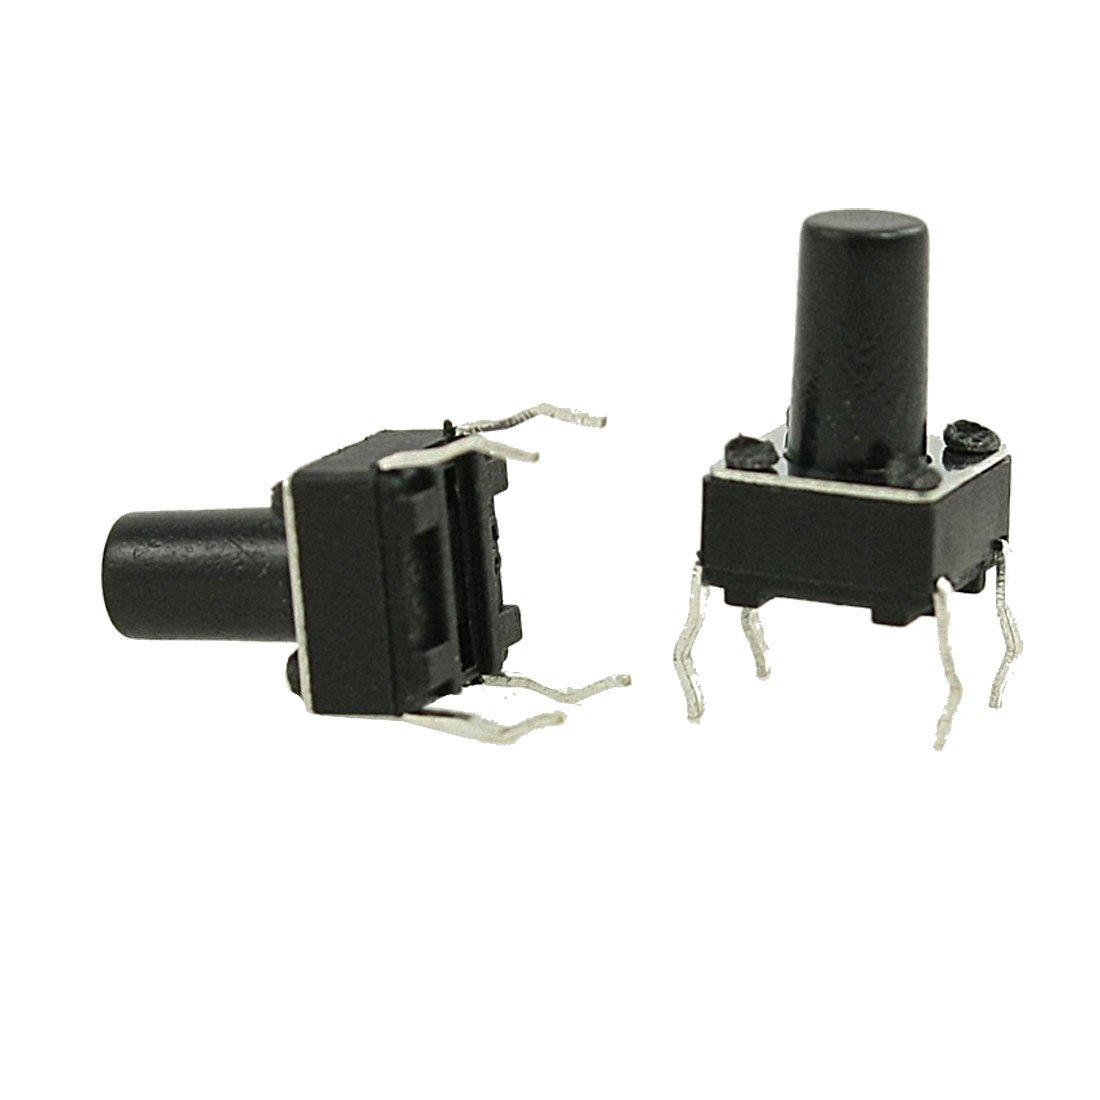 uxcell 100 Pcs 6 x 6mm 9.5mm Tactile B Tact Momentary PCB Max 41% OFF Push Max 64% OFF